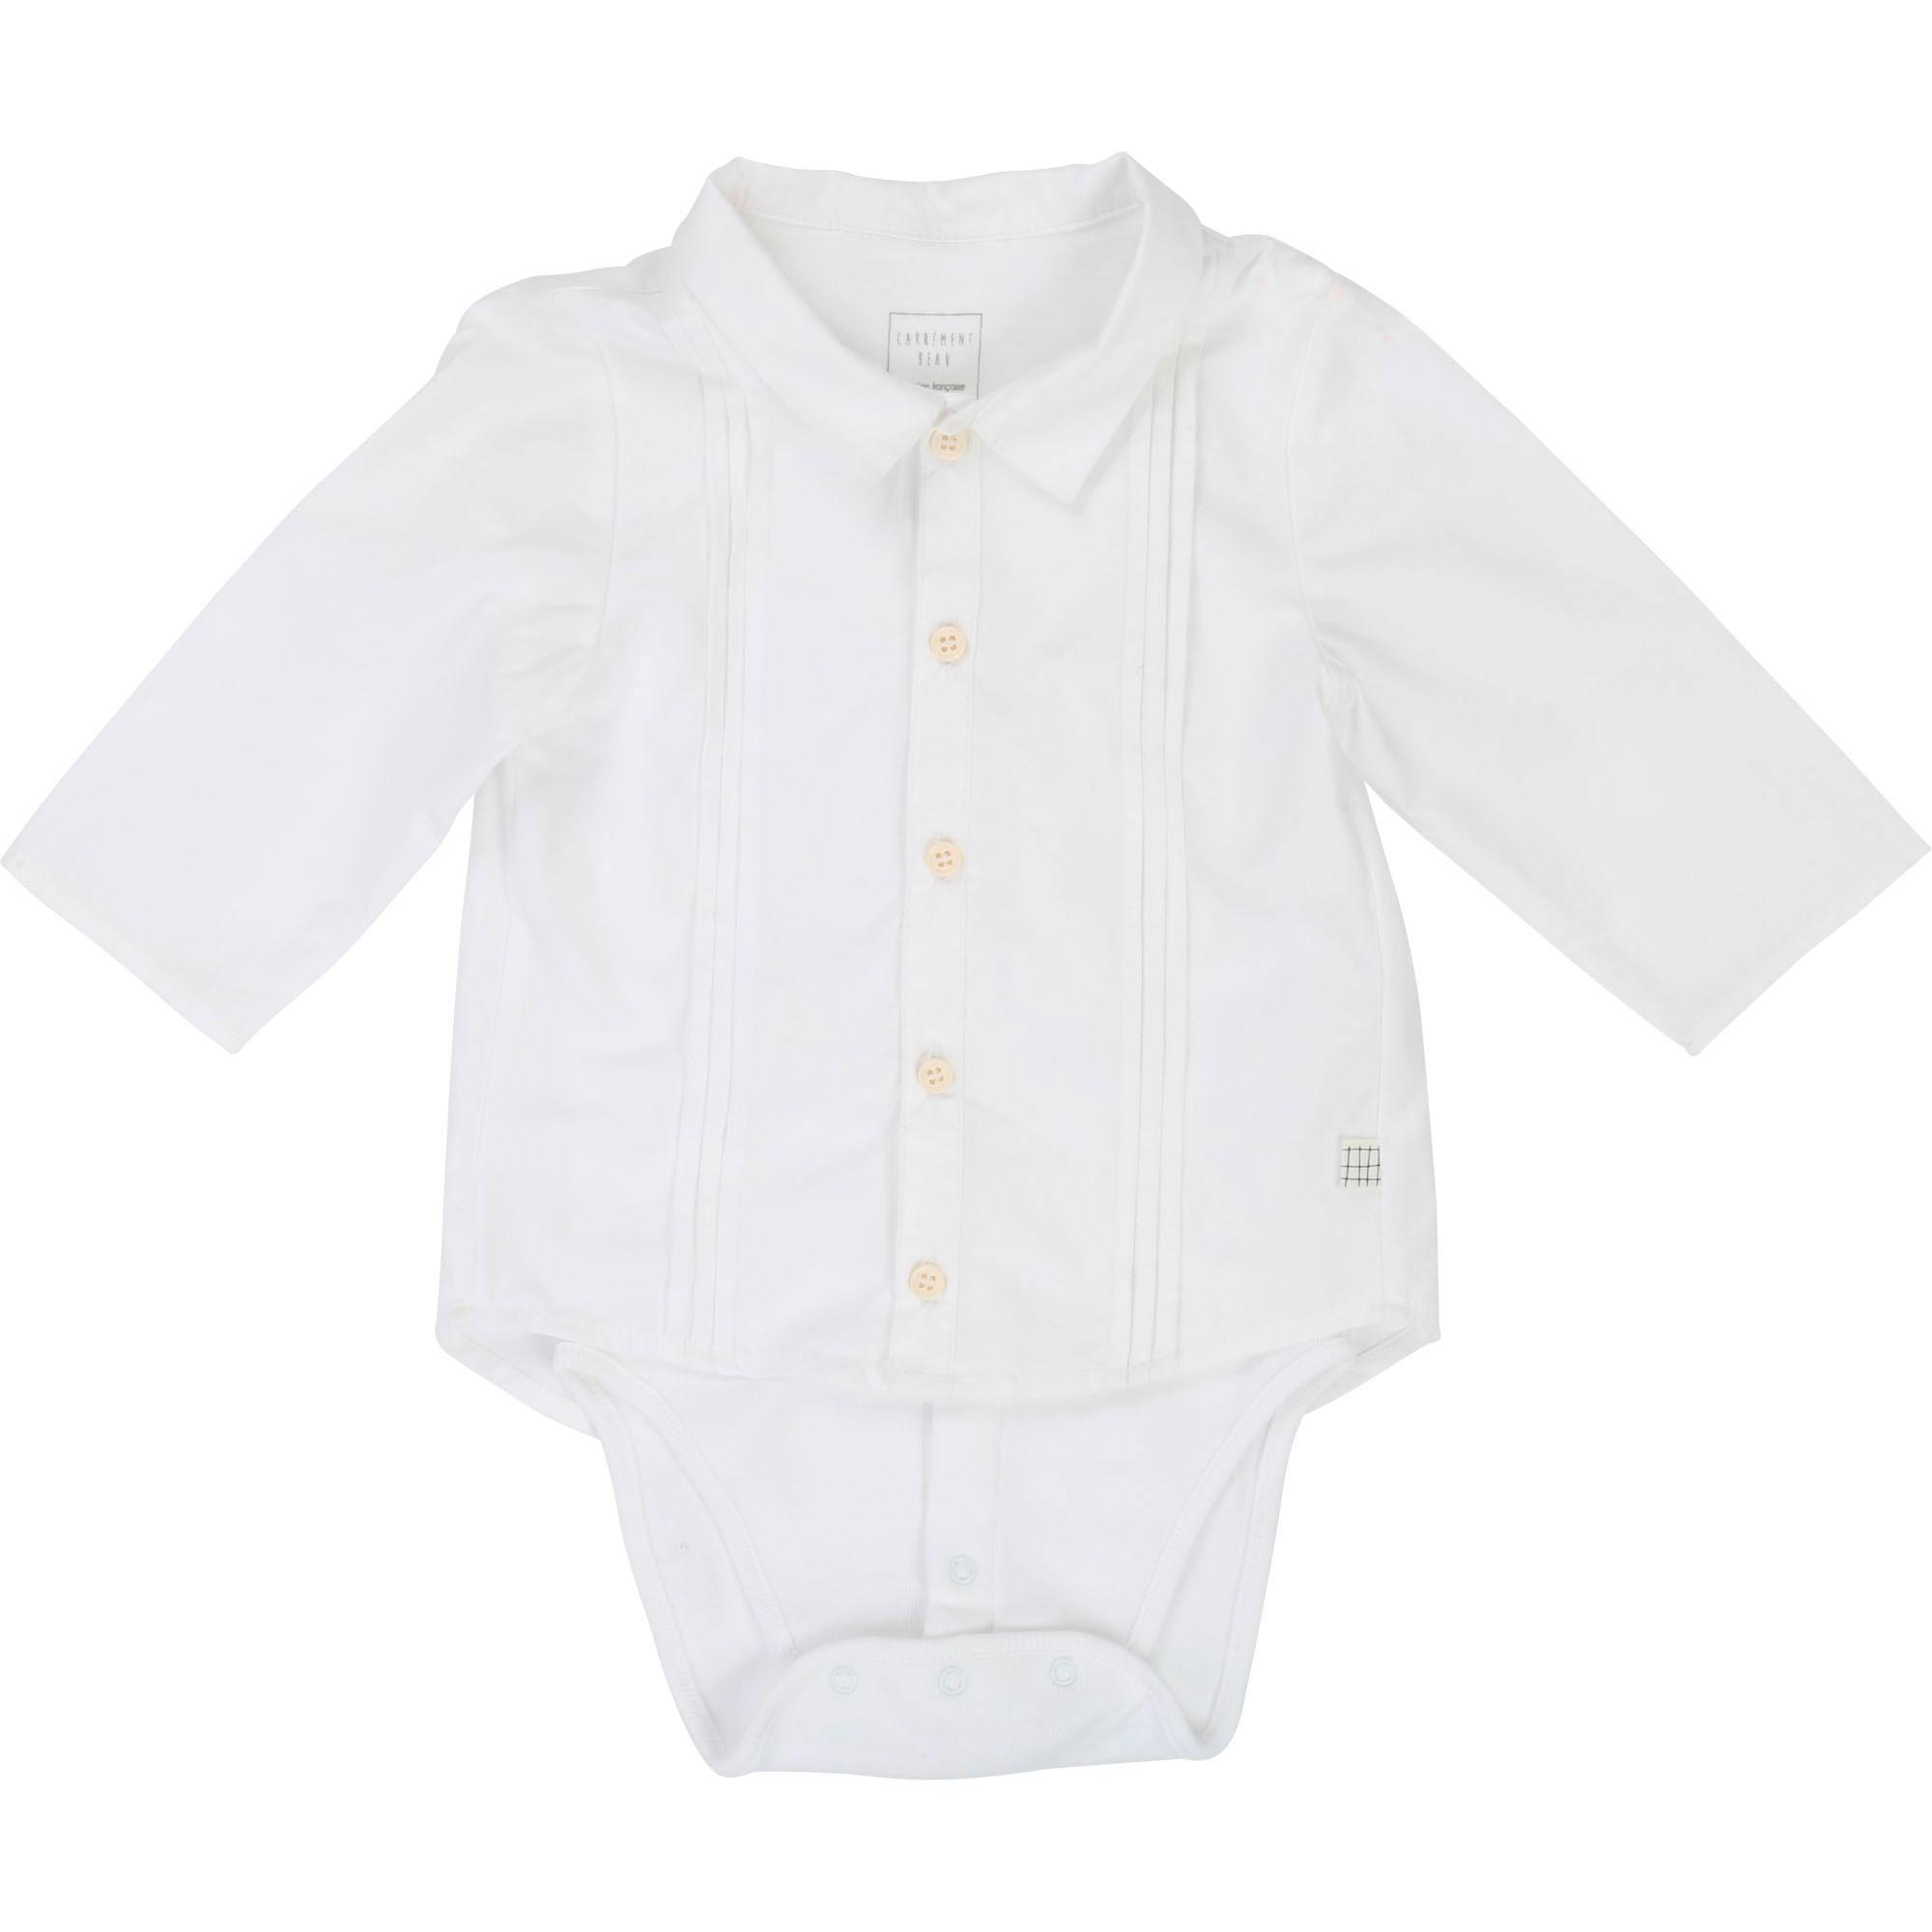 Body-chemise CARREMENT BEAU BEBE COUCHE GARCON Blanc